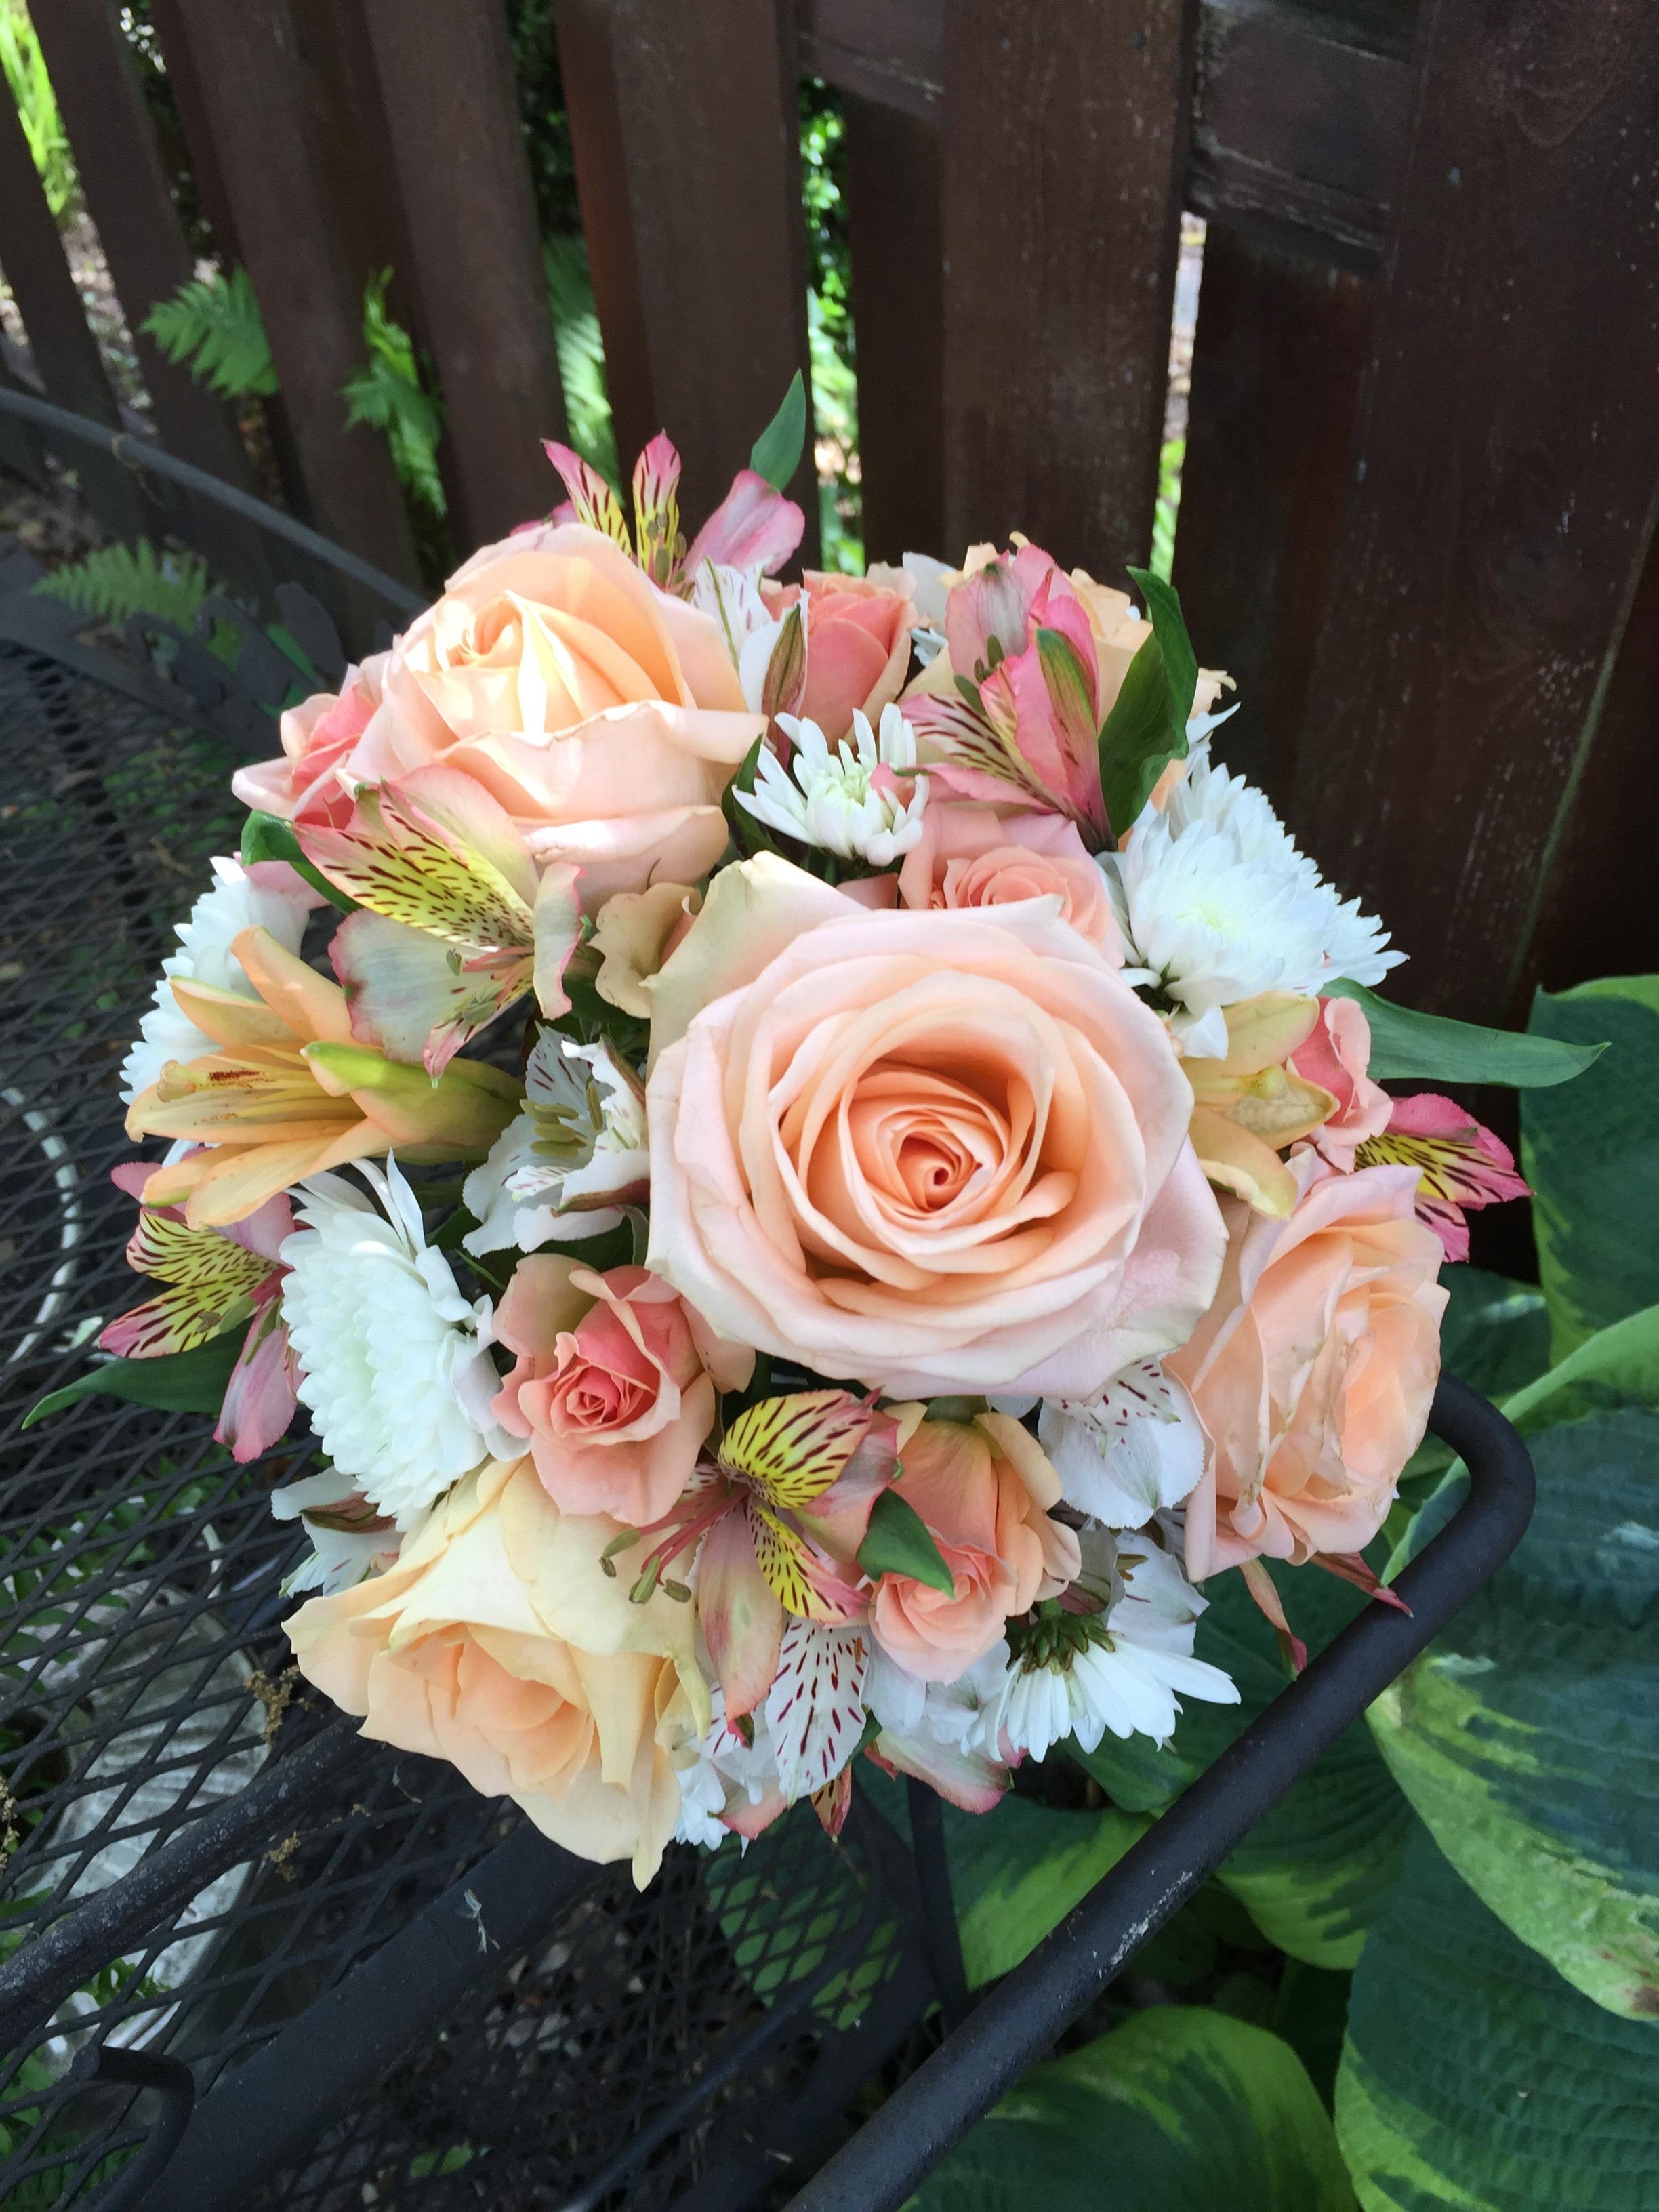 Roses, alstromeria, and chrysanthemums